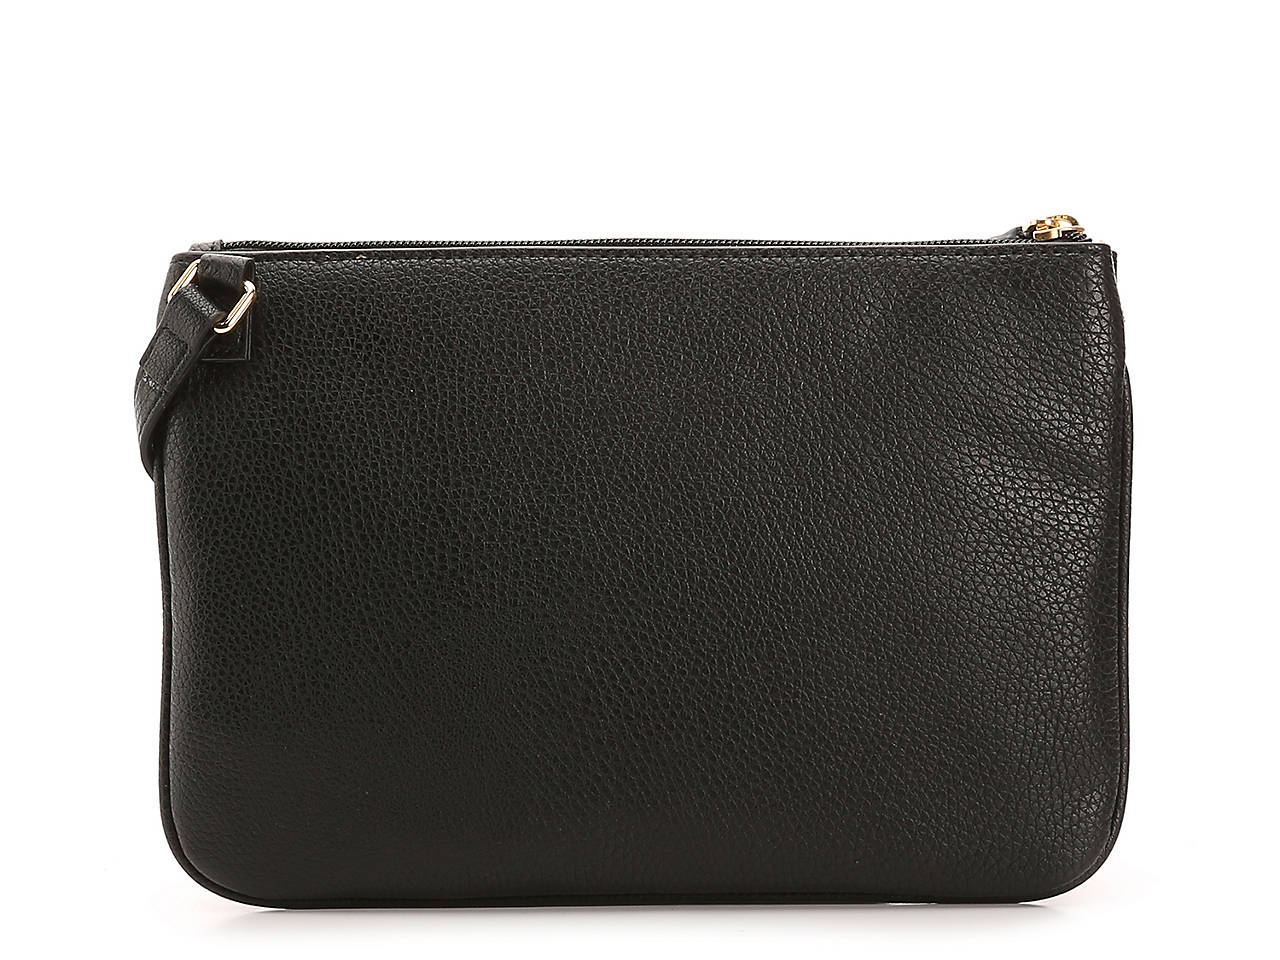 3da5e68d33 Lauren Ralph Lauren Anfield II Crossbody Bag Women s Handbags ...